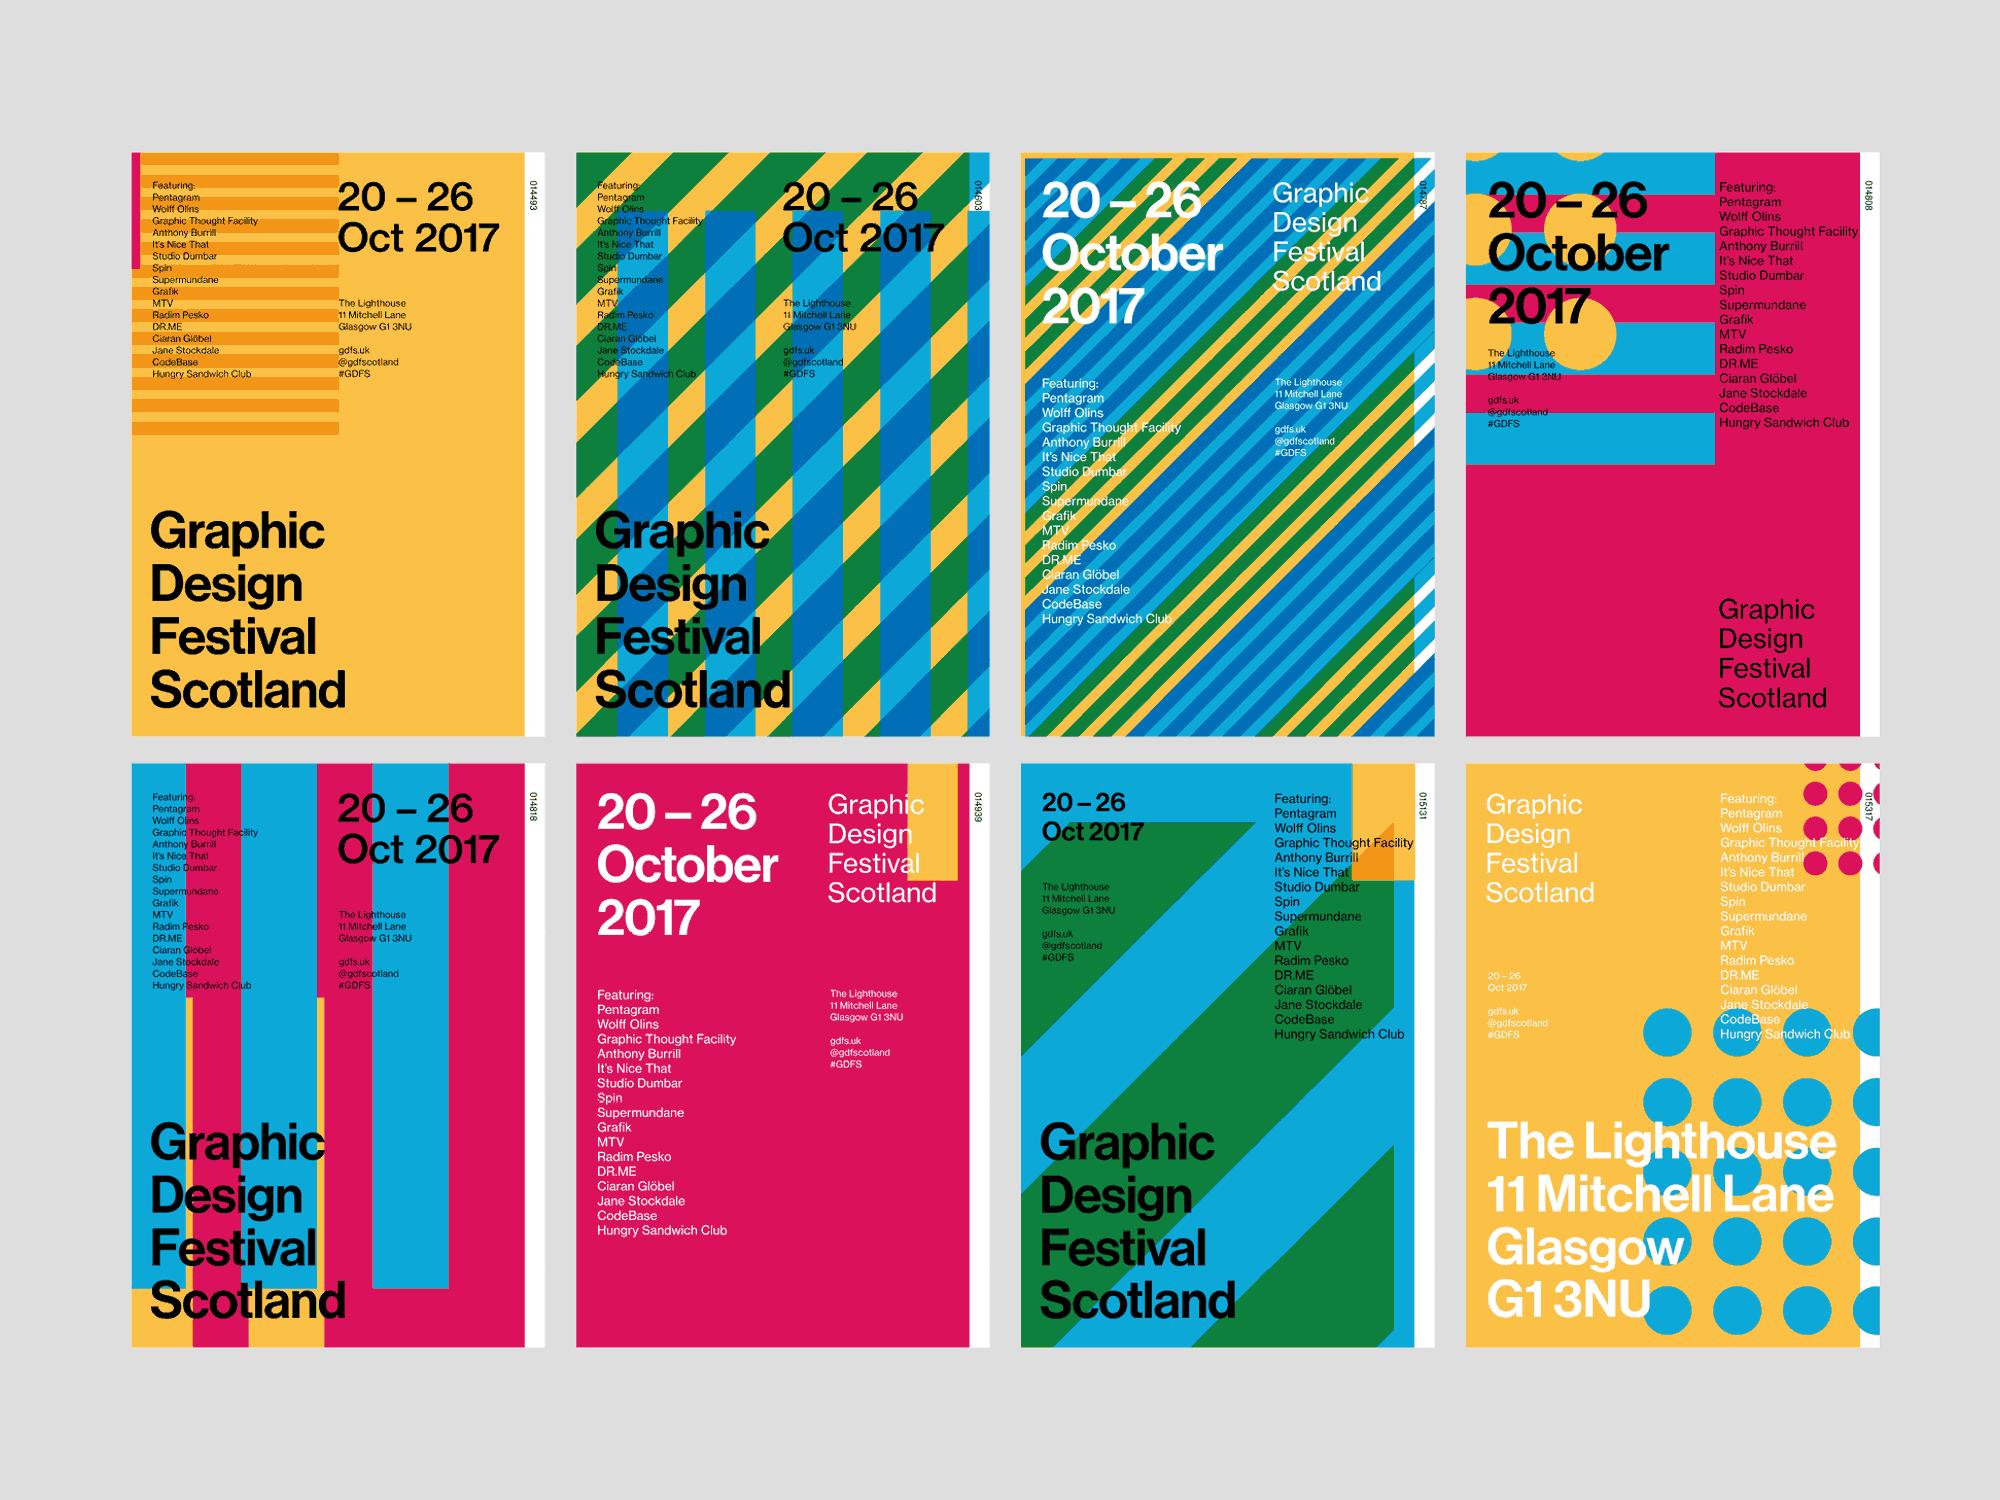 gdfs poster generator wins european design award infinite eye